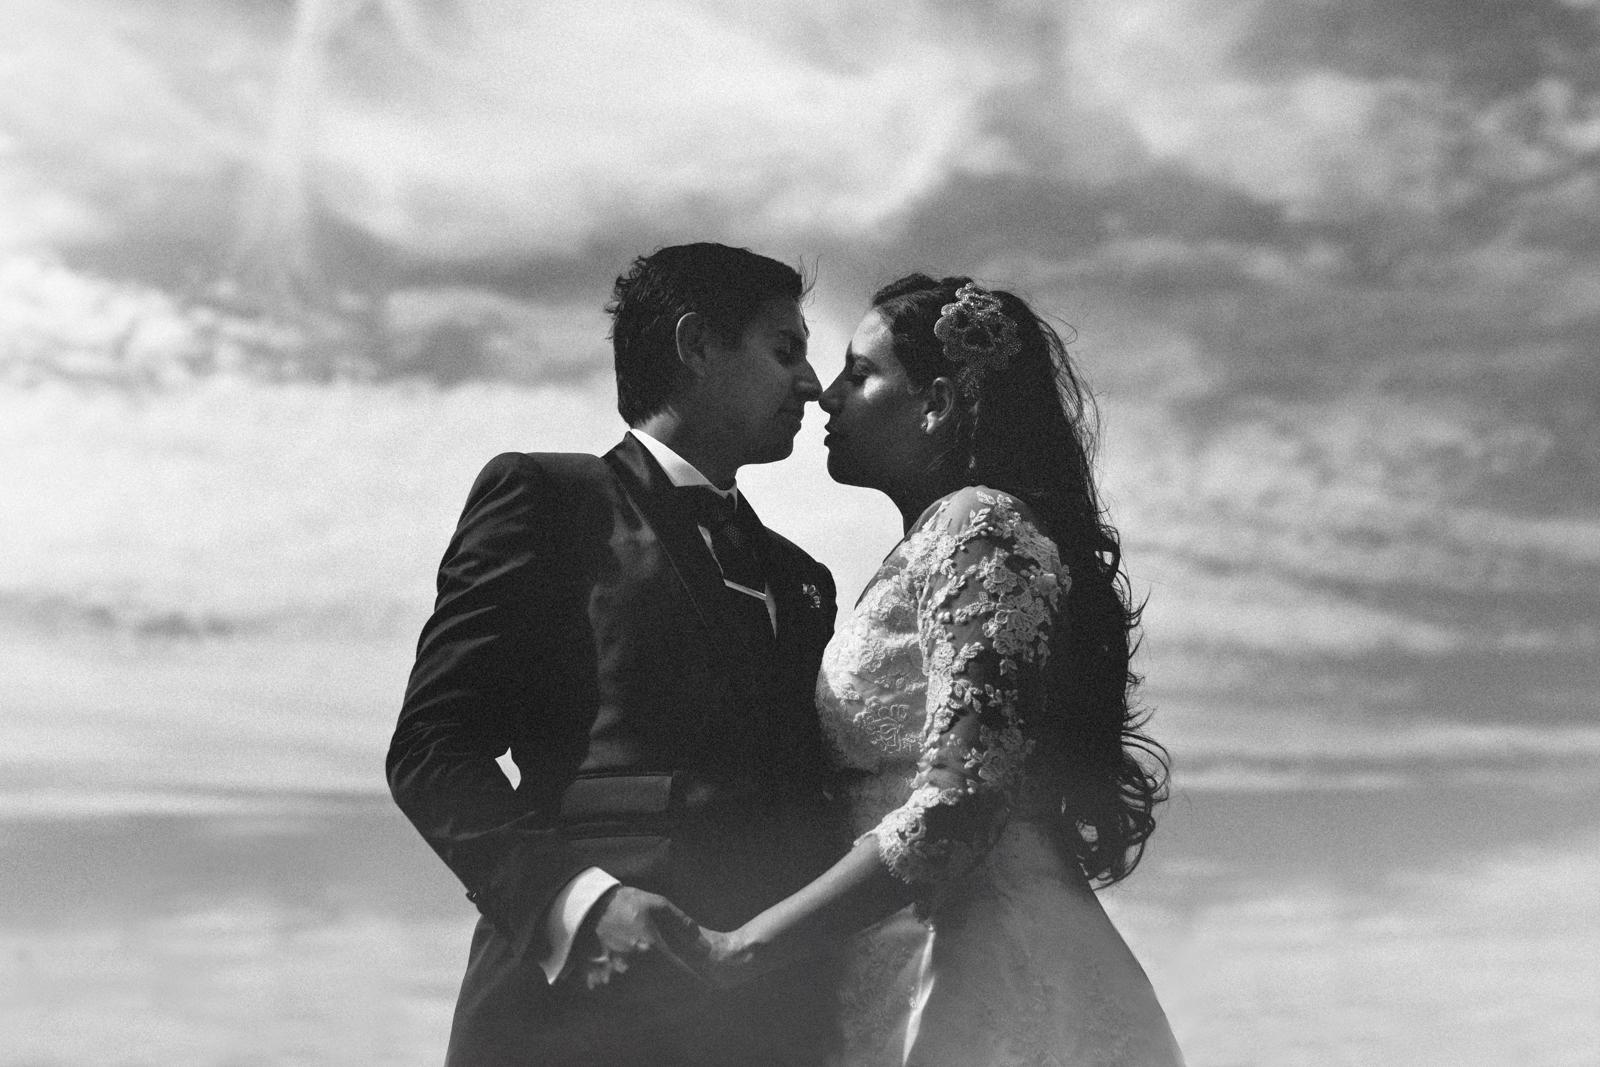 NYC Wedding Photography Lofts at Prince Brooklyn NYC Photographer Boris Zaretsky _B2C5007-Edit.jpg